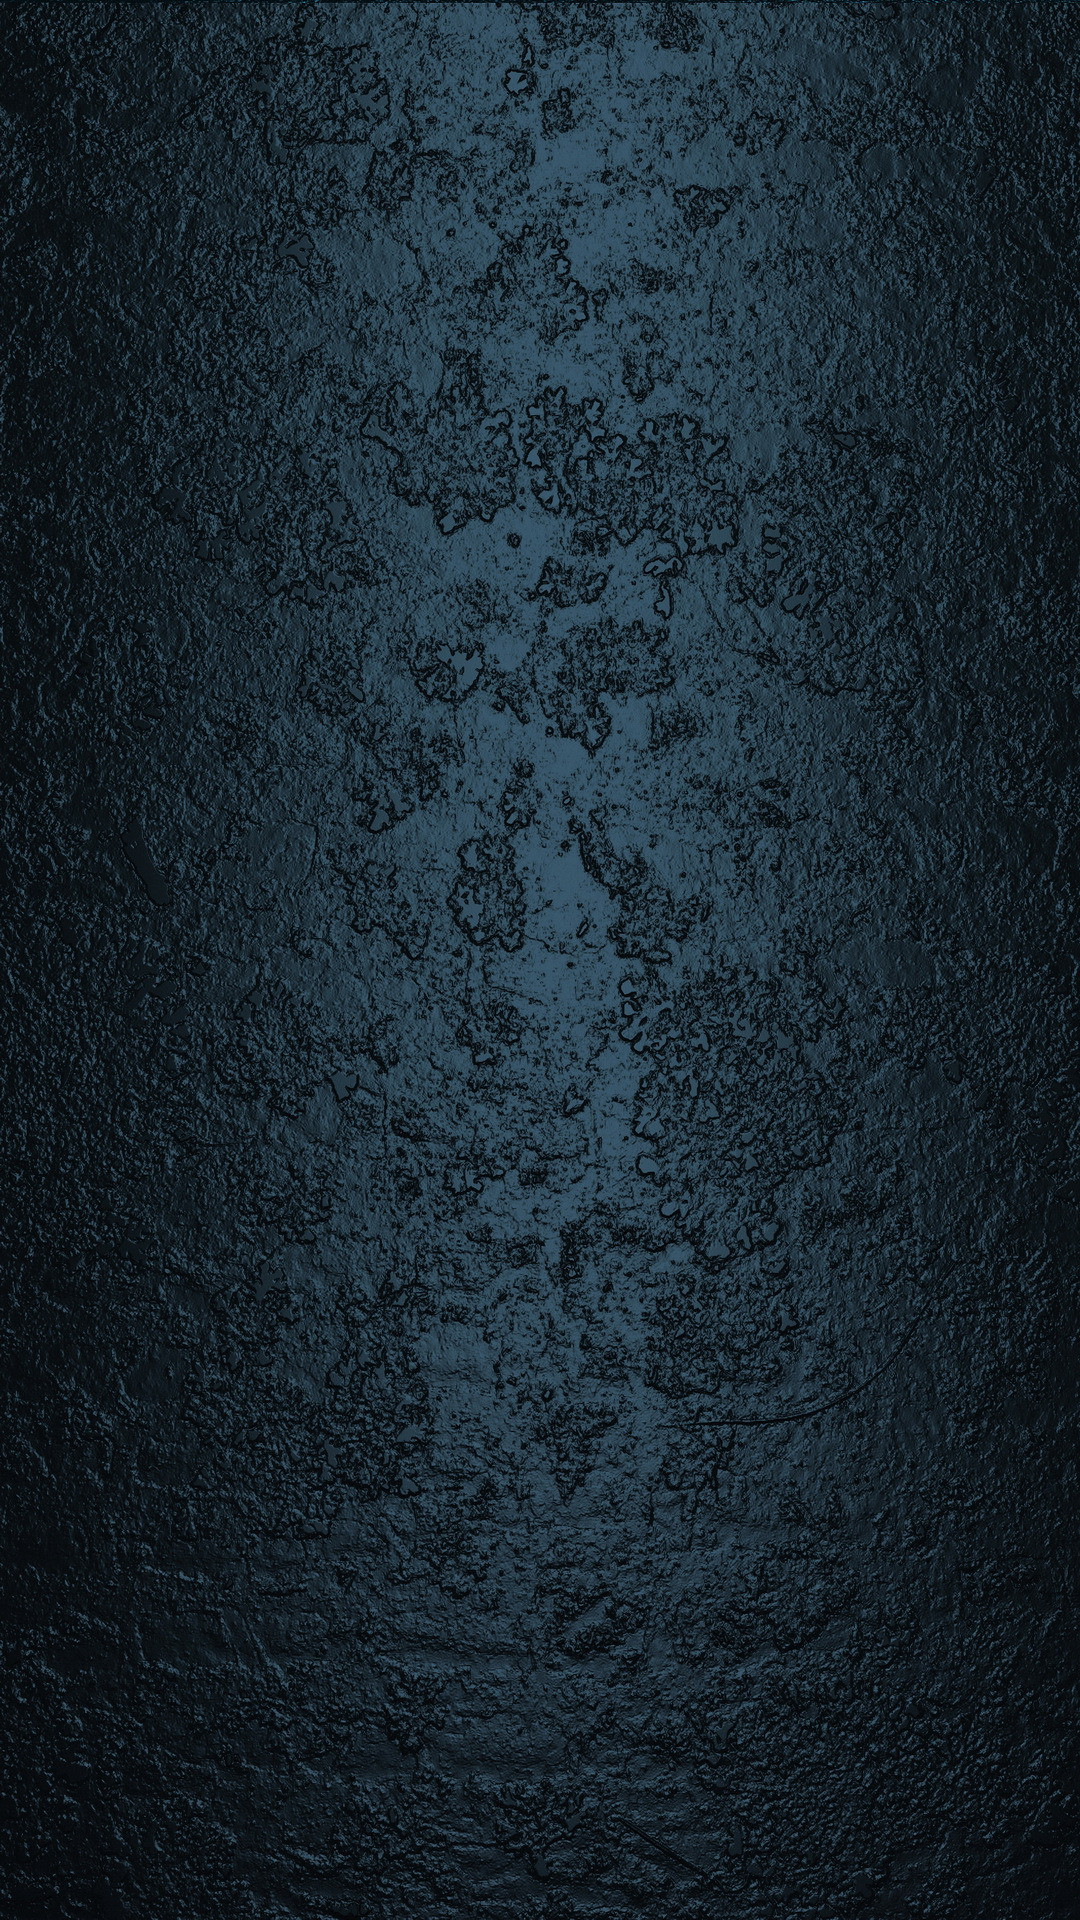 Blue Metallic. Iphone 6 Wallpaper